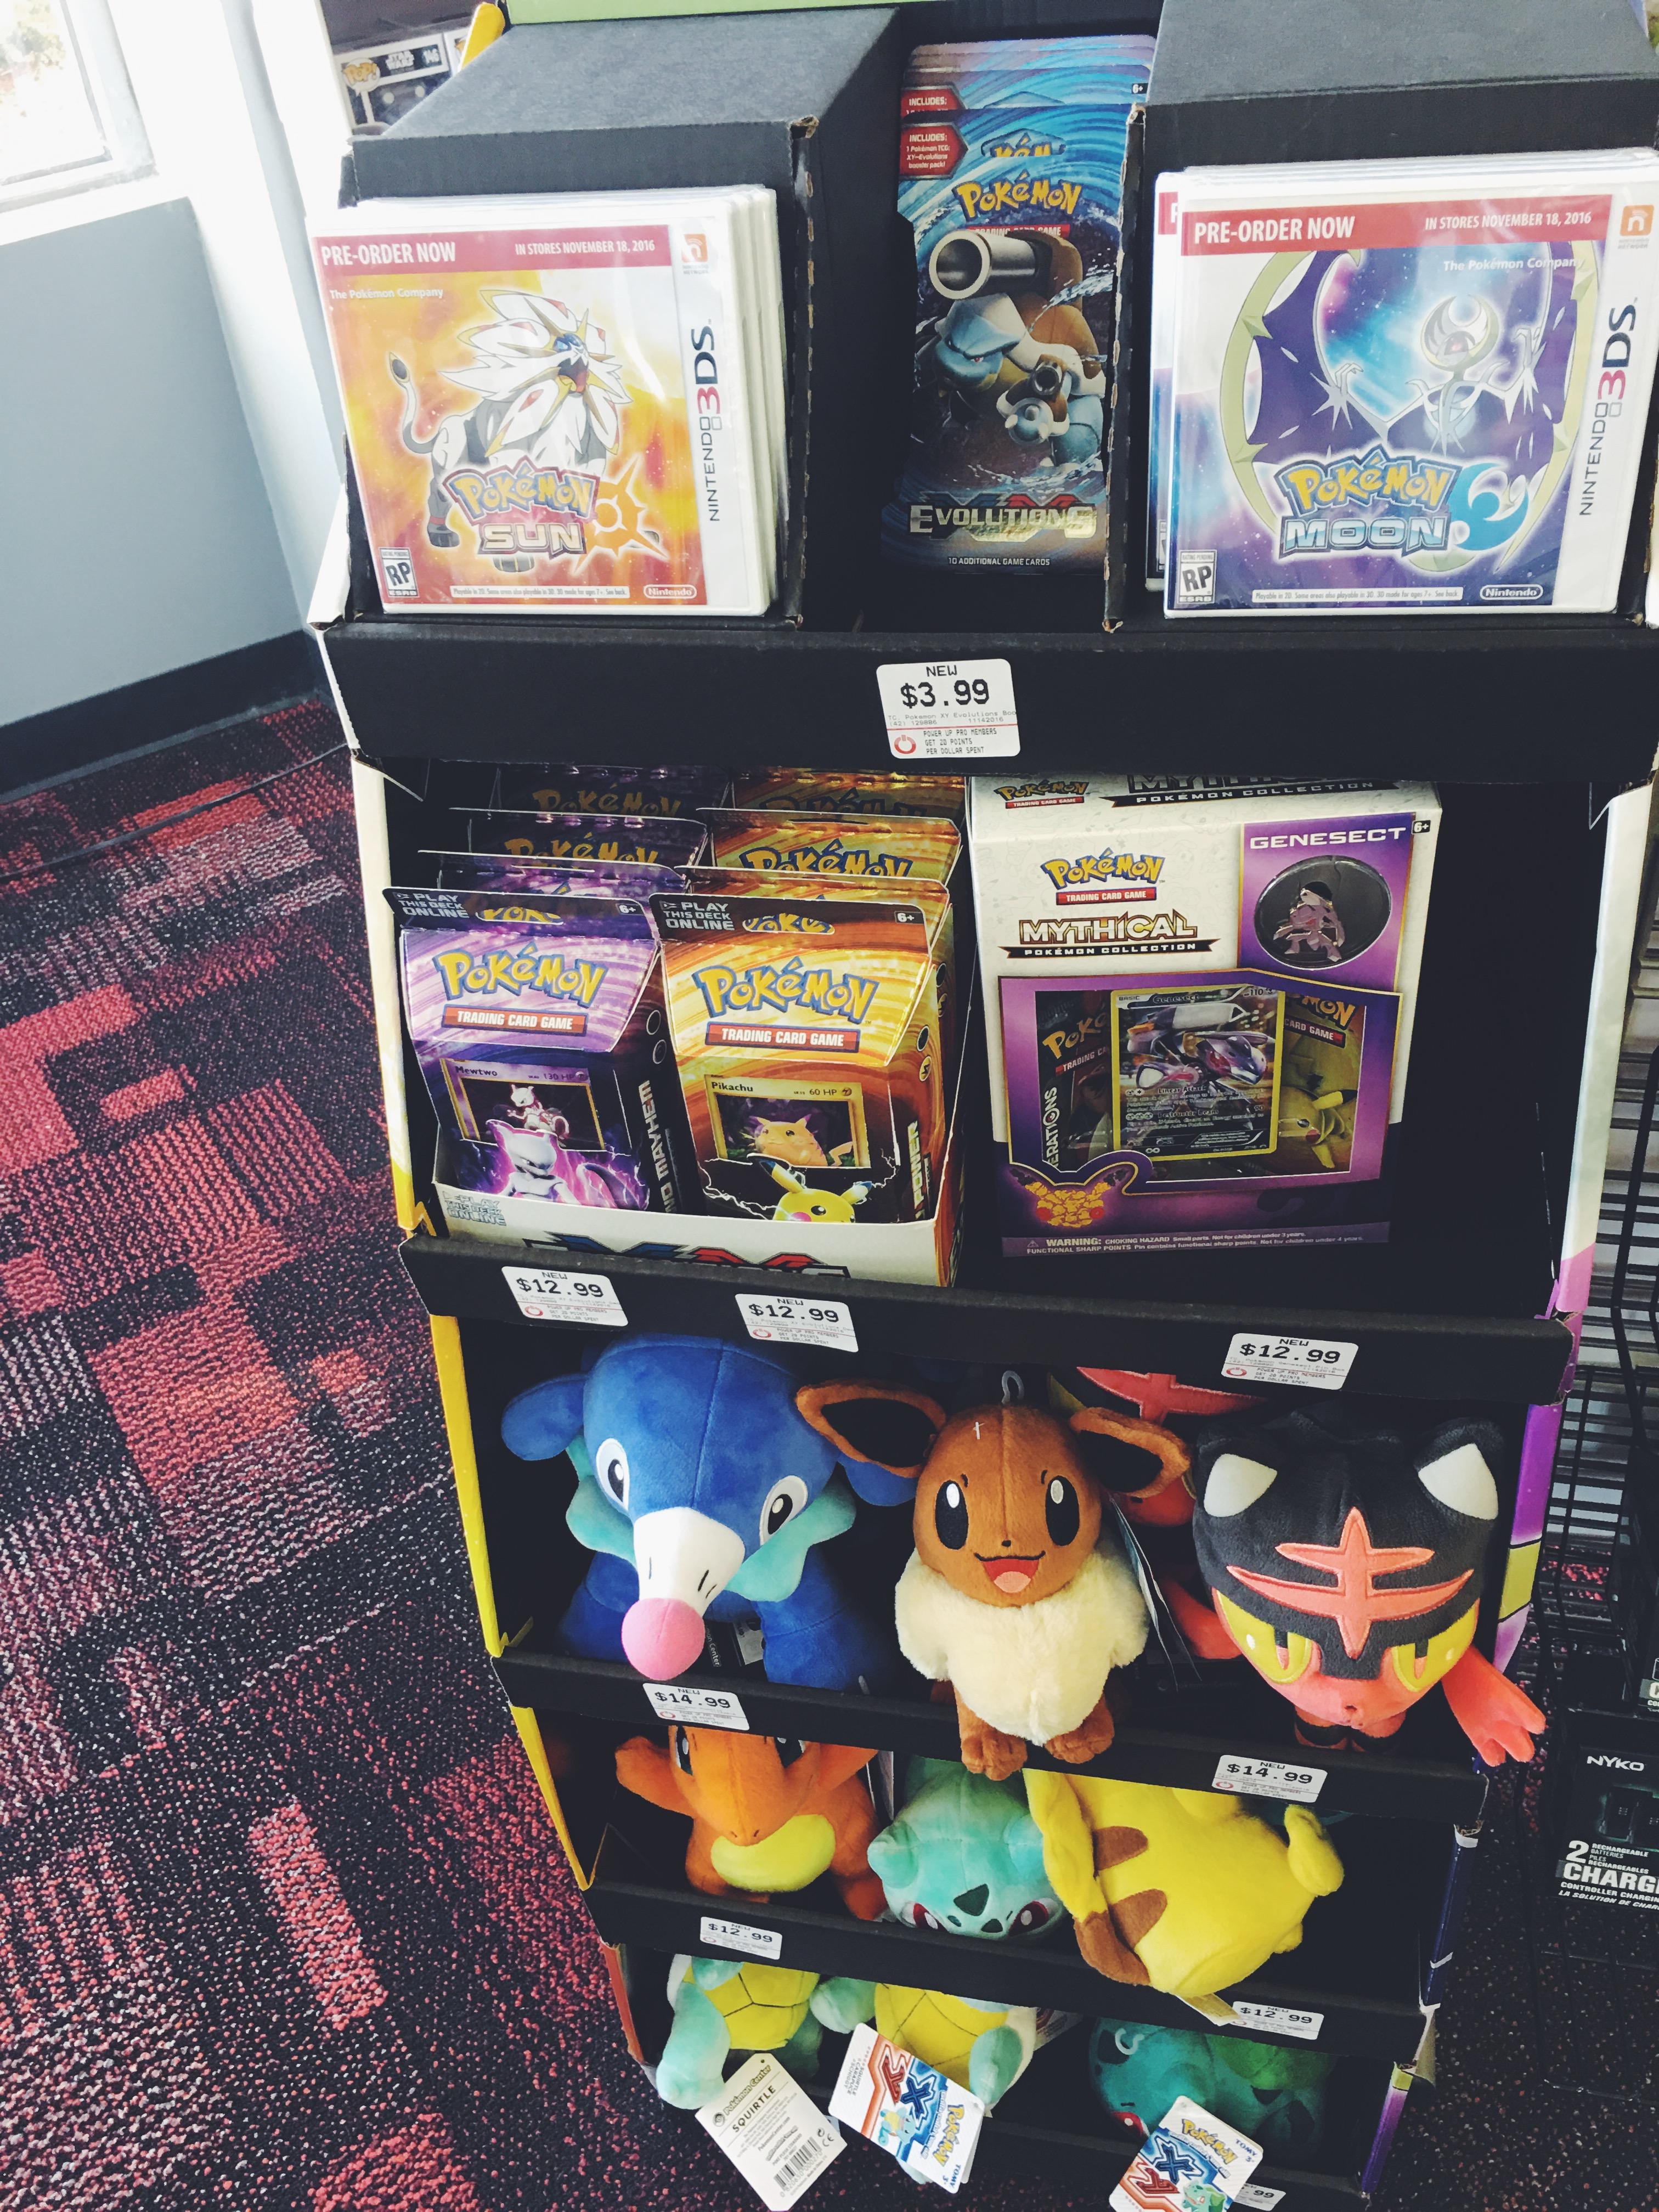 Pokemon Moon and Pokemon Sun Games at GameStop